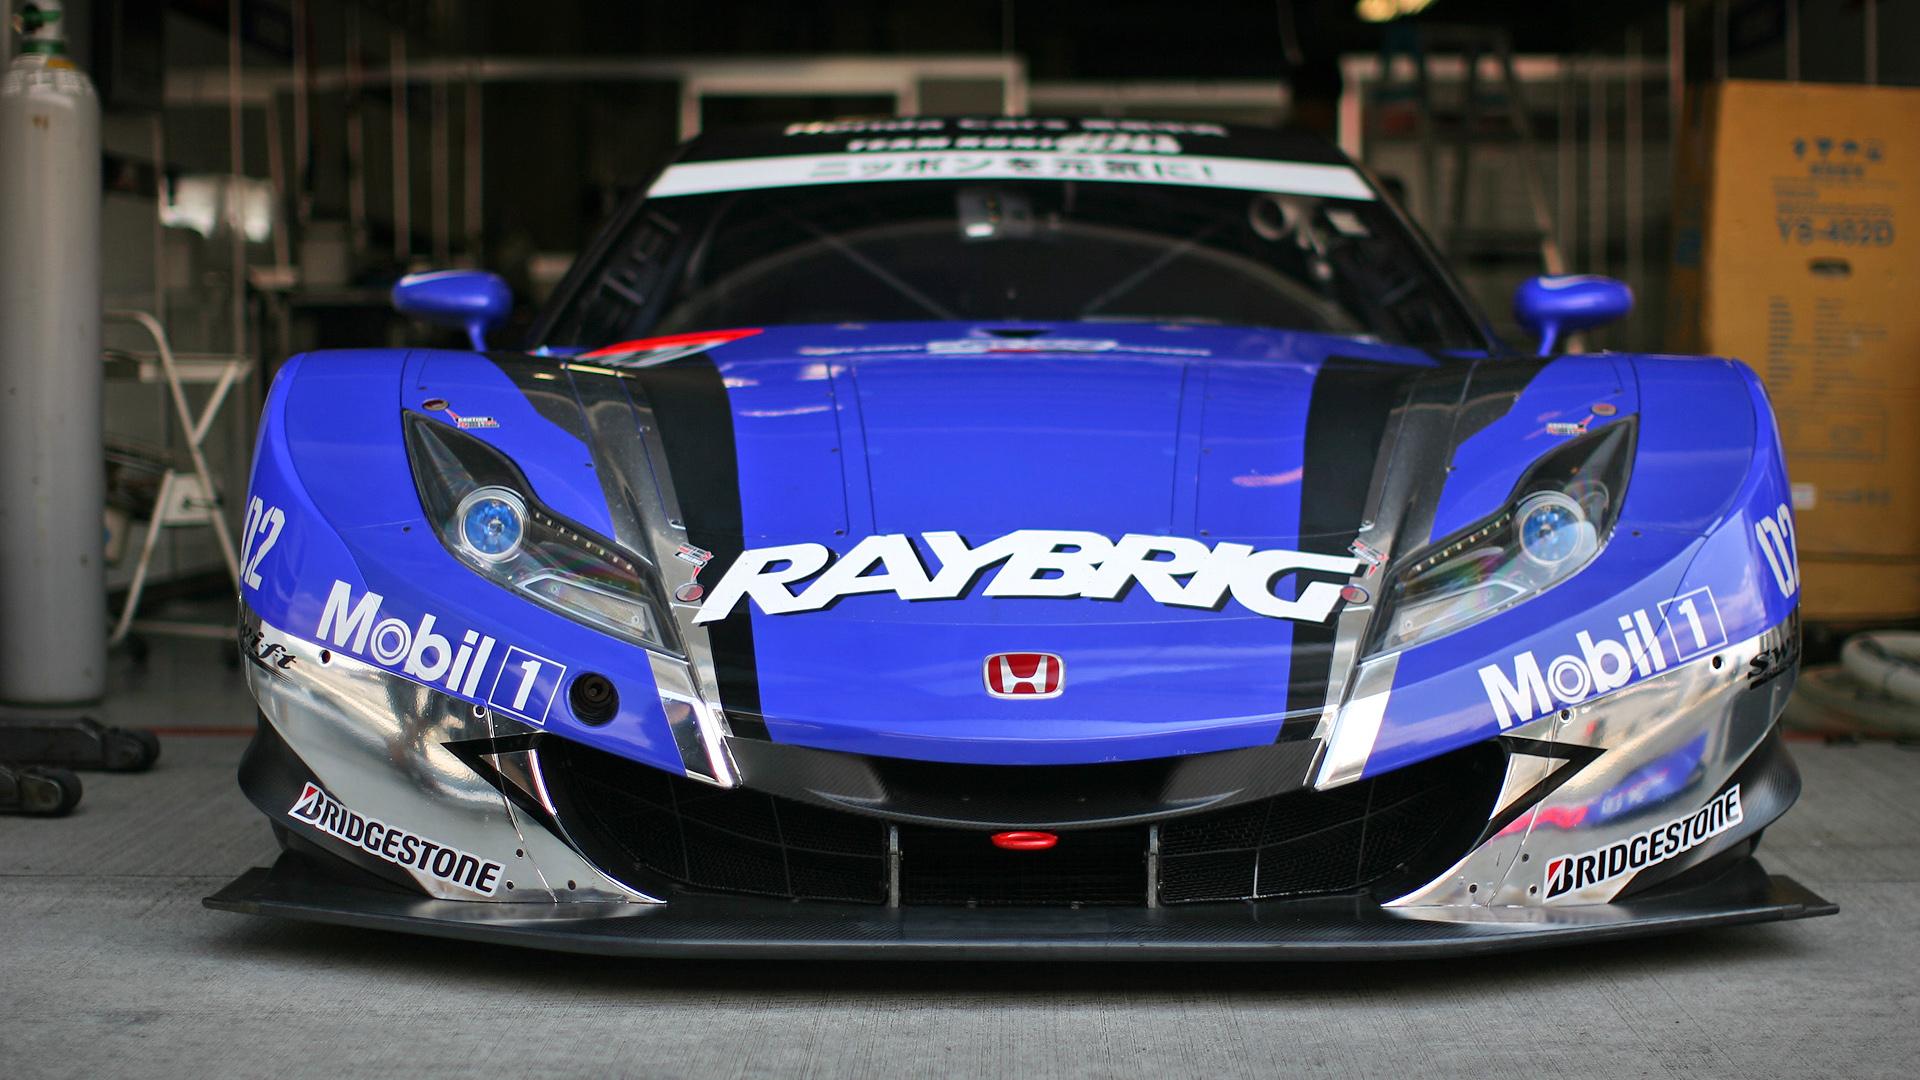 raybrig hsv super gt wallpaper hd car